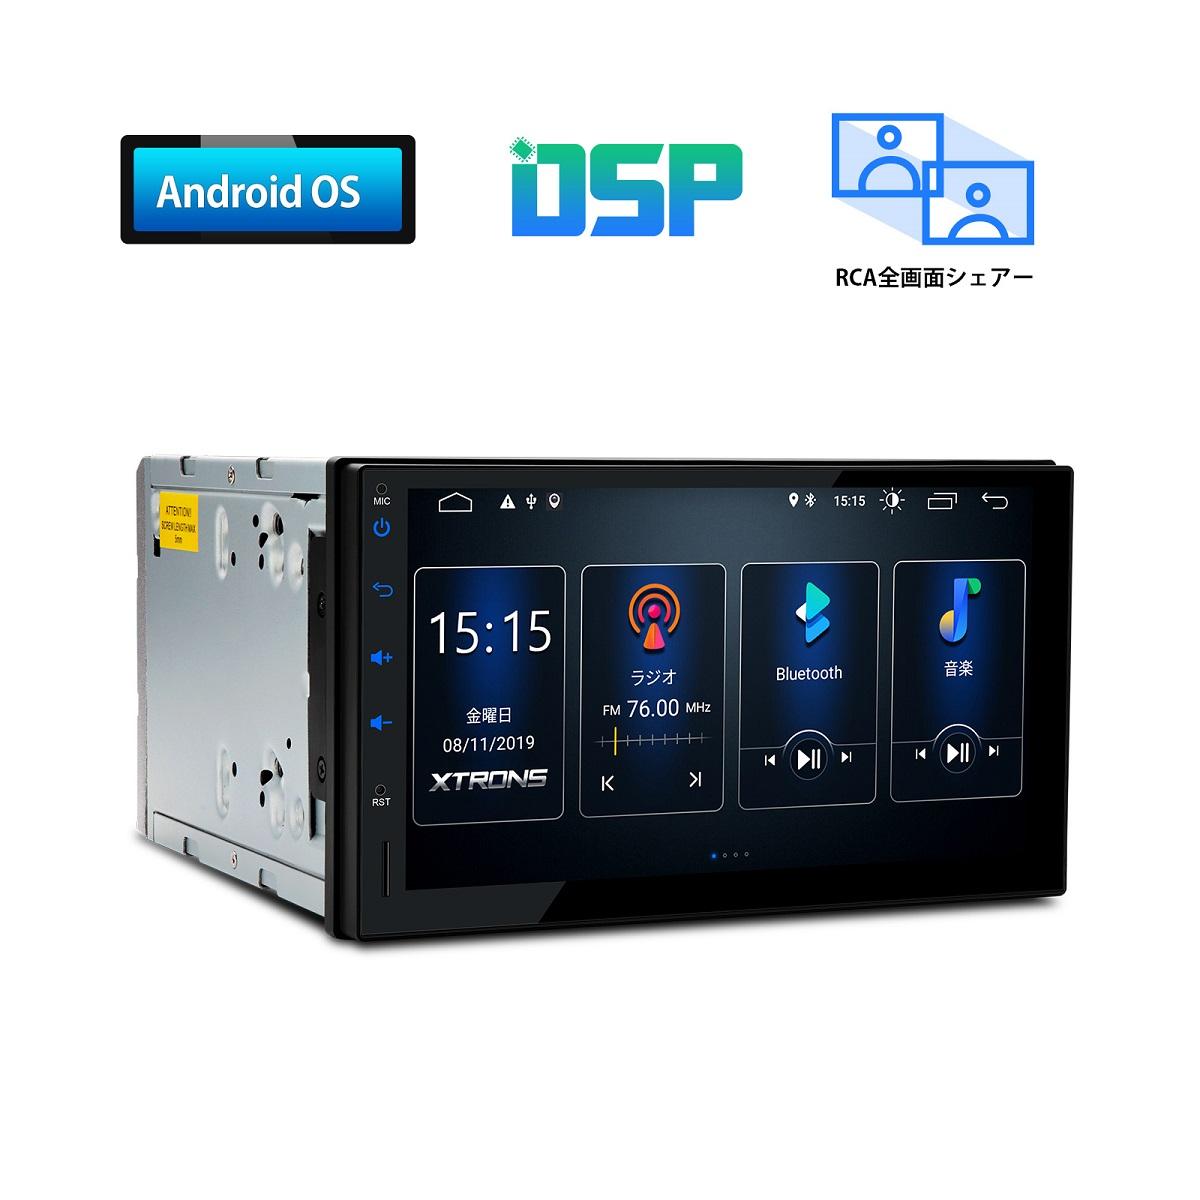 (TSD700L)XTRONS 7インチ 2DIN 静電式車載PC Android 高画質 カーステレオ カーオーディオ カーナビ 4G WIFI ミラーリング OBD2 DVR対応 全画面シェアー DSP